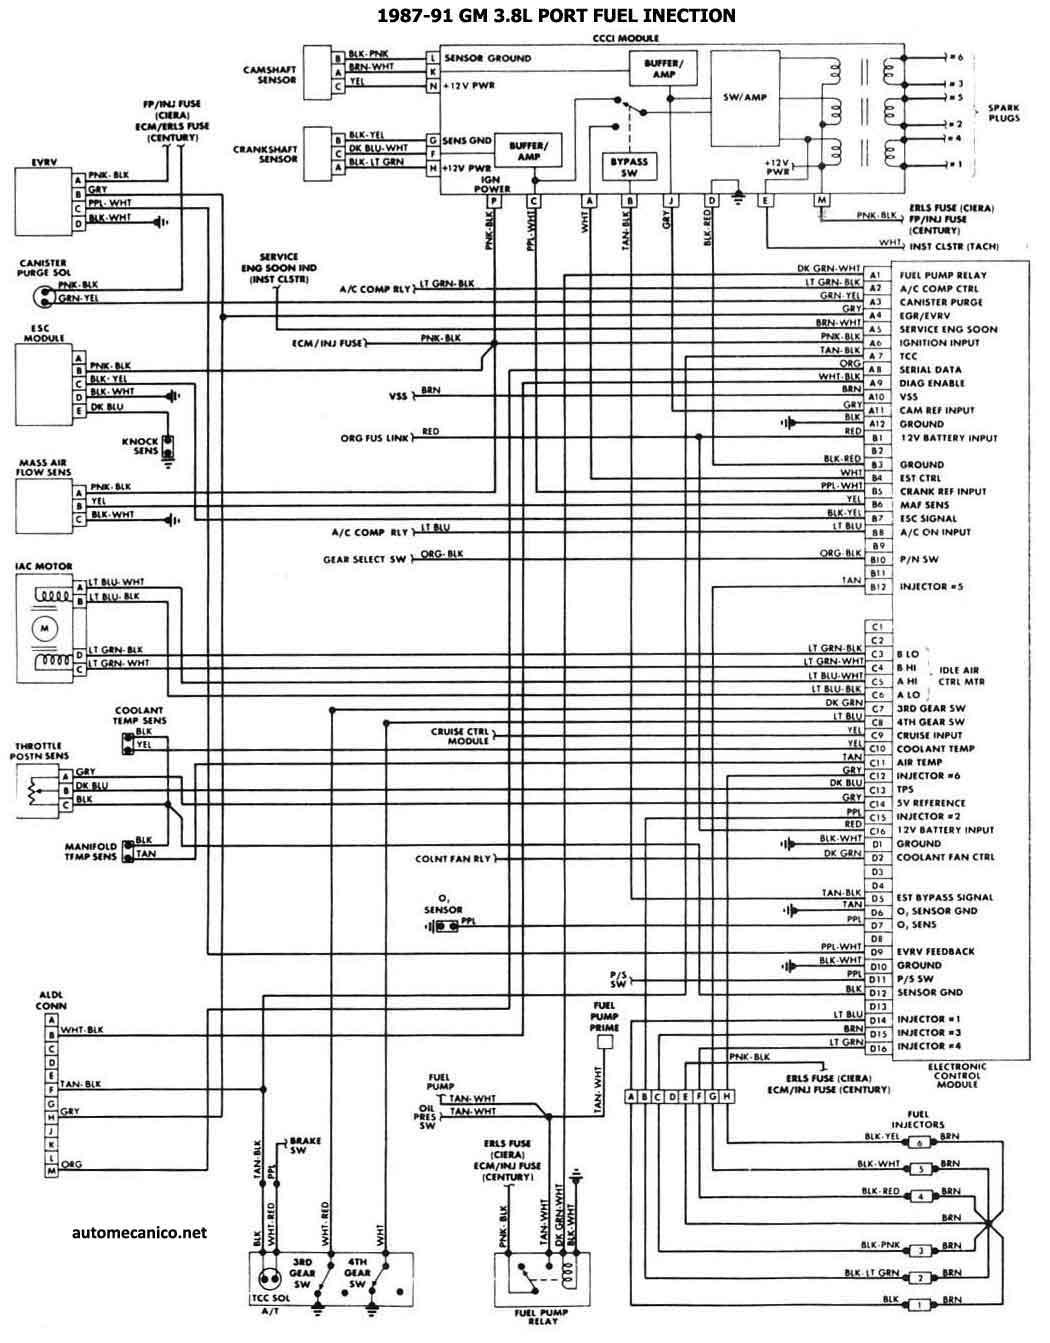 2018 Ford Truck Vin Decoder | Wiring Diagram Database